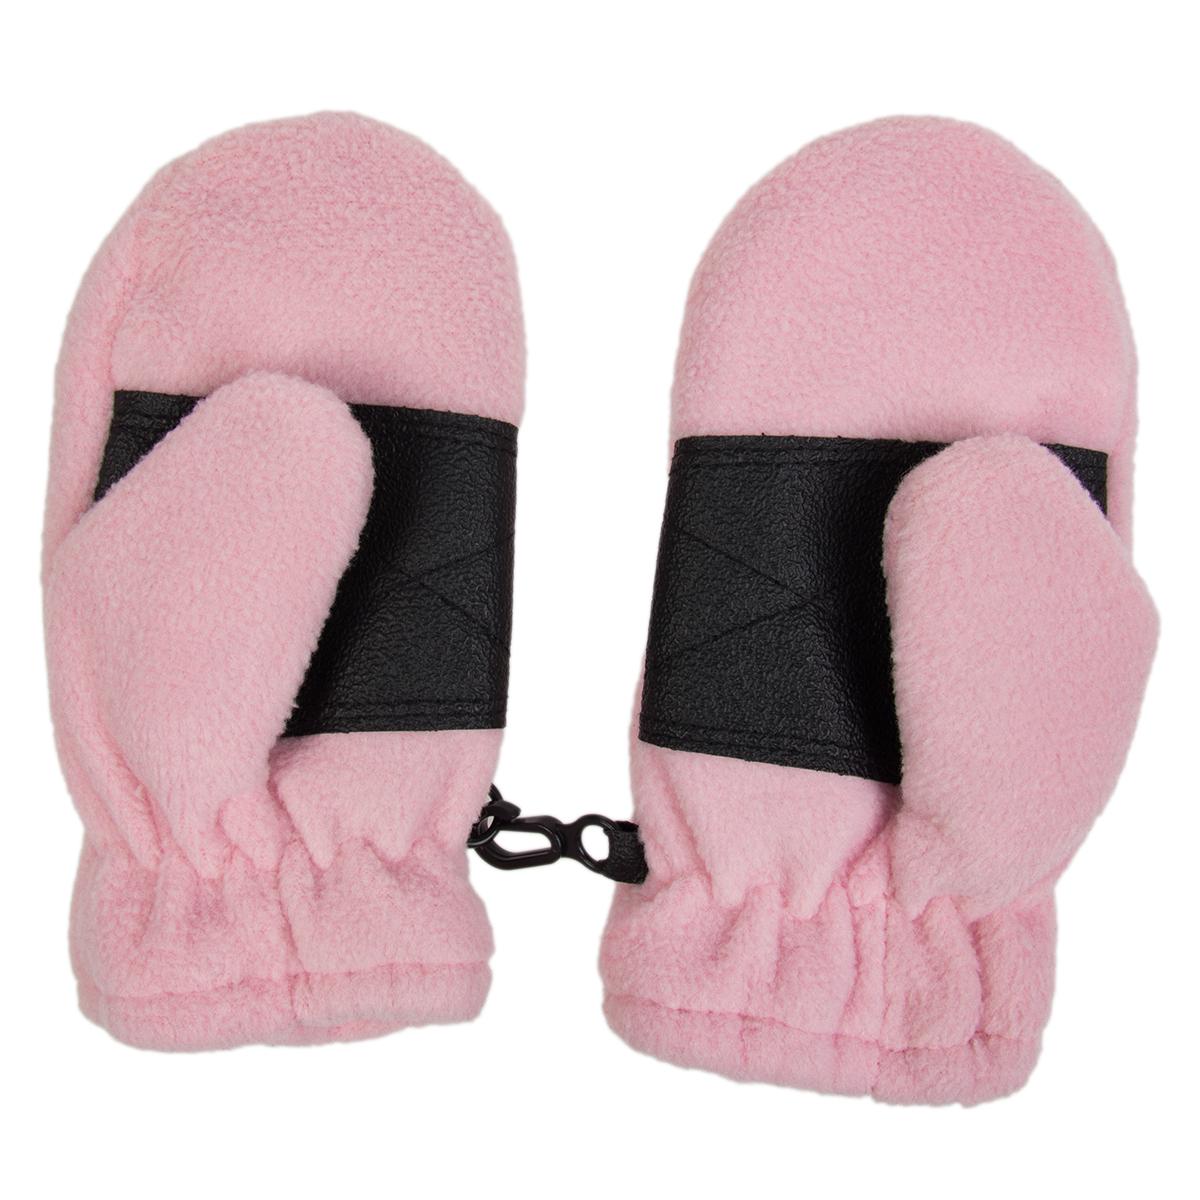 Toddler Fleece Insulated Mittens Boys Girls Clips Palm